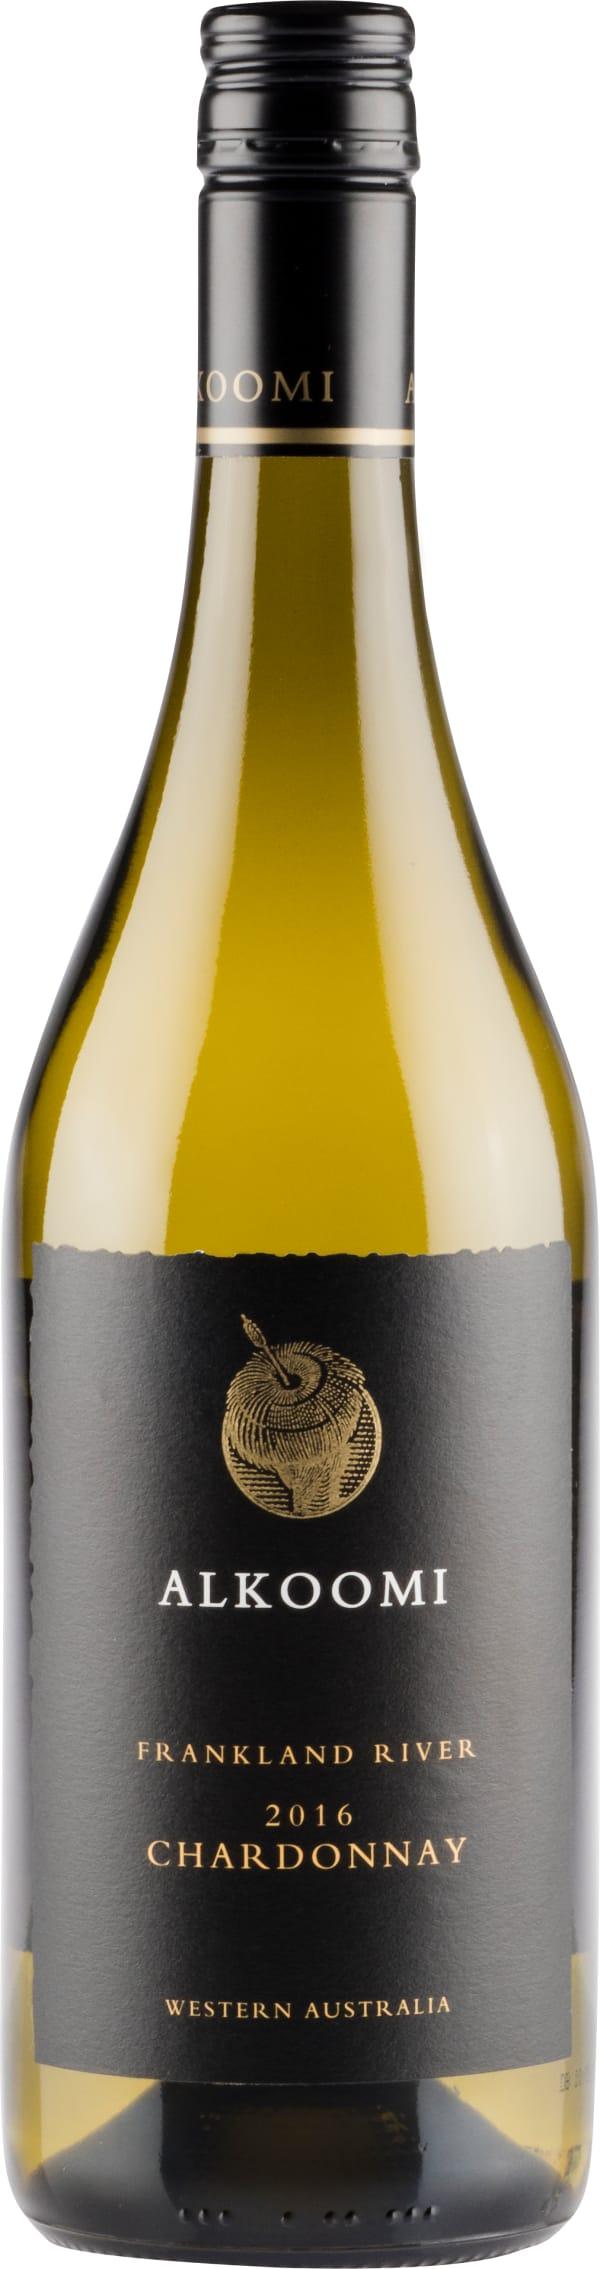 Alkoomi Black Label Chardonnay 2016